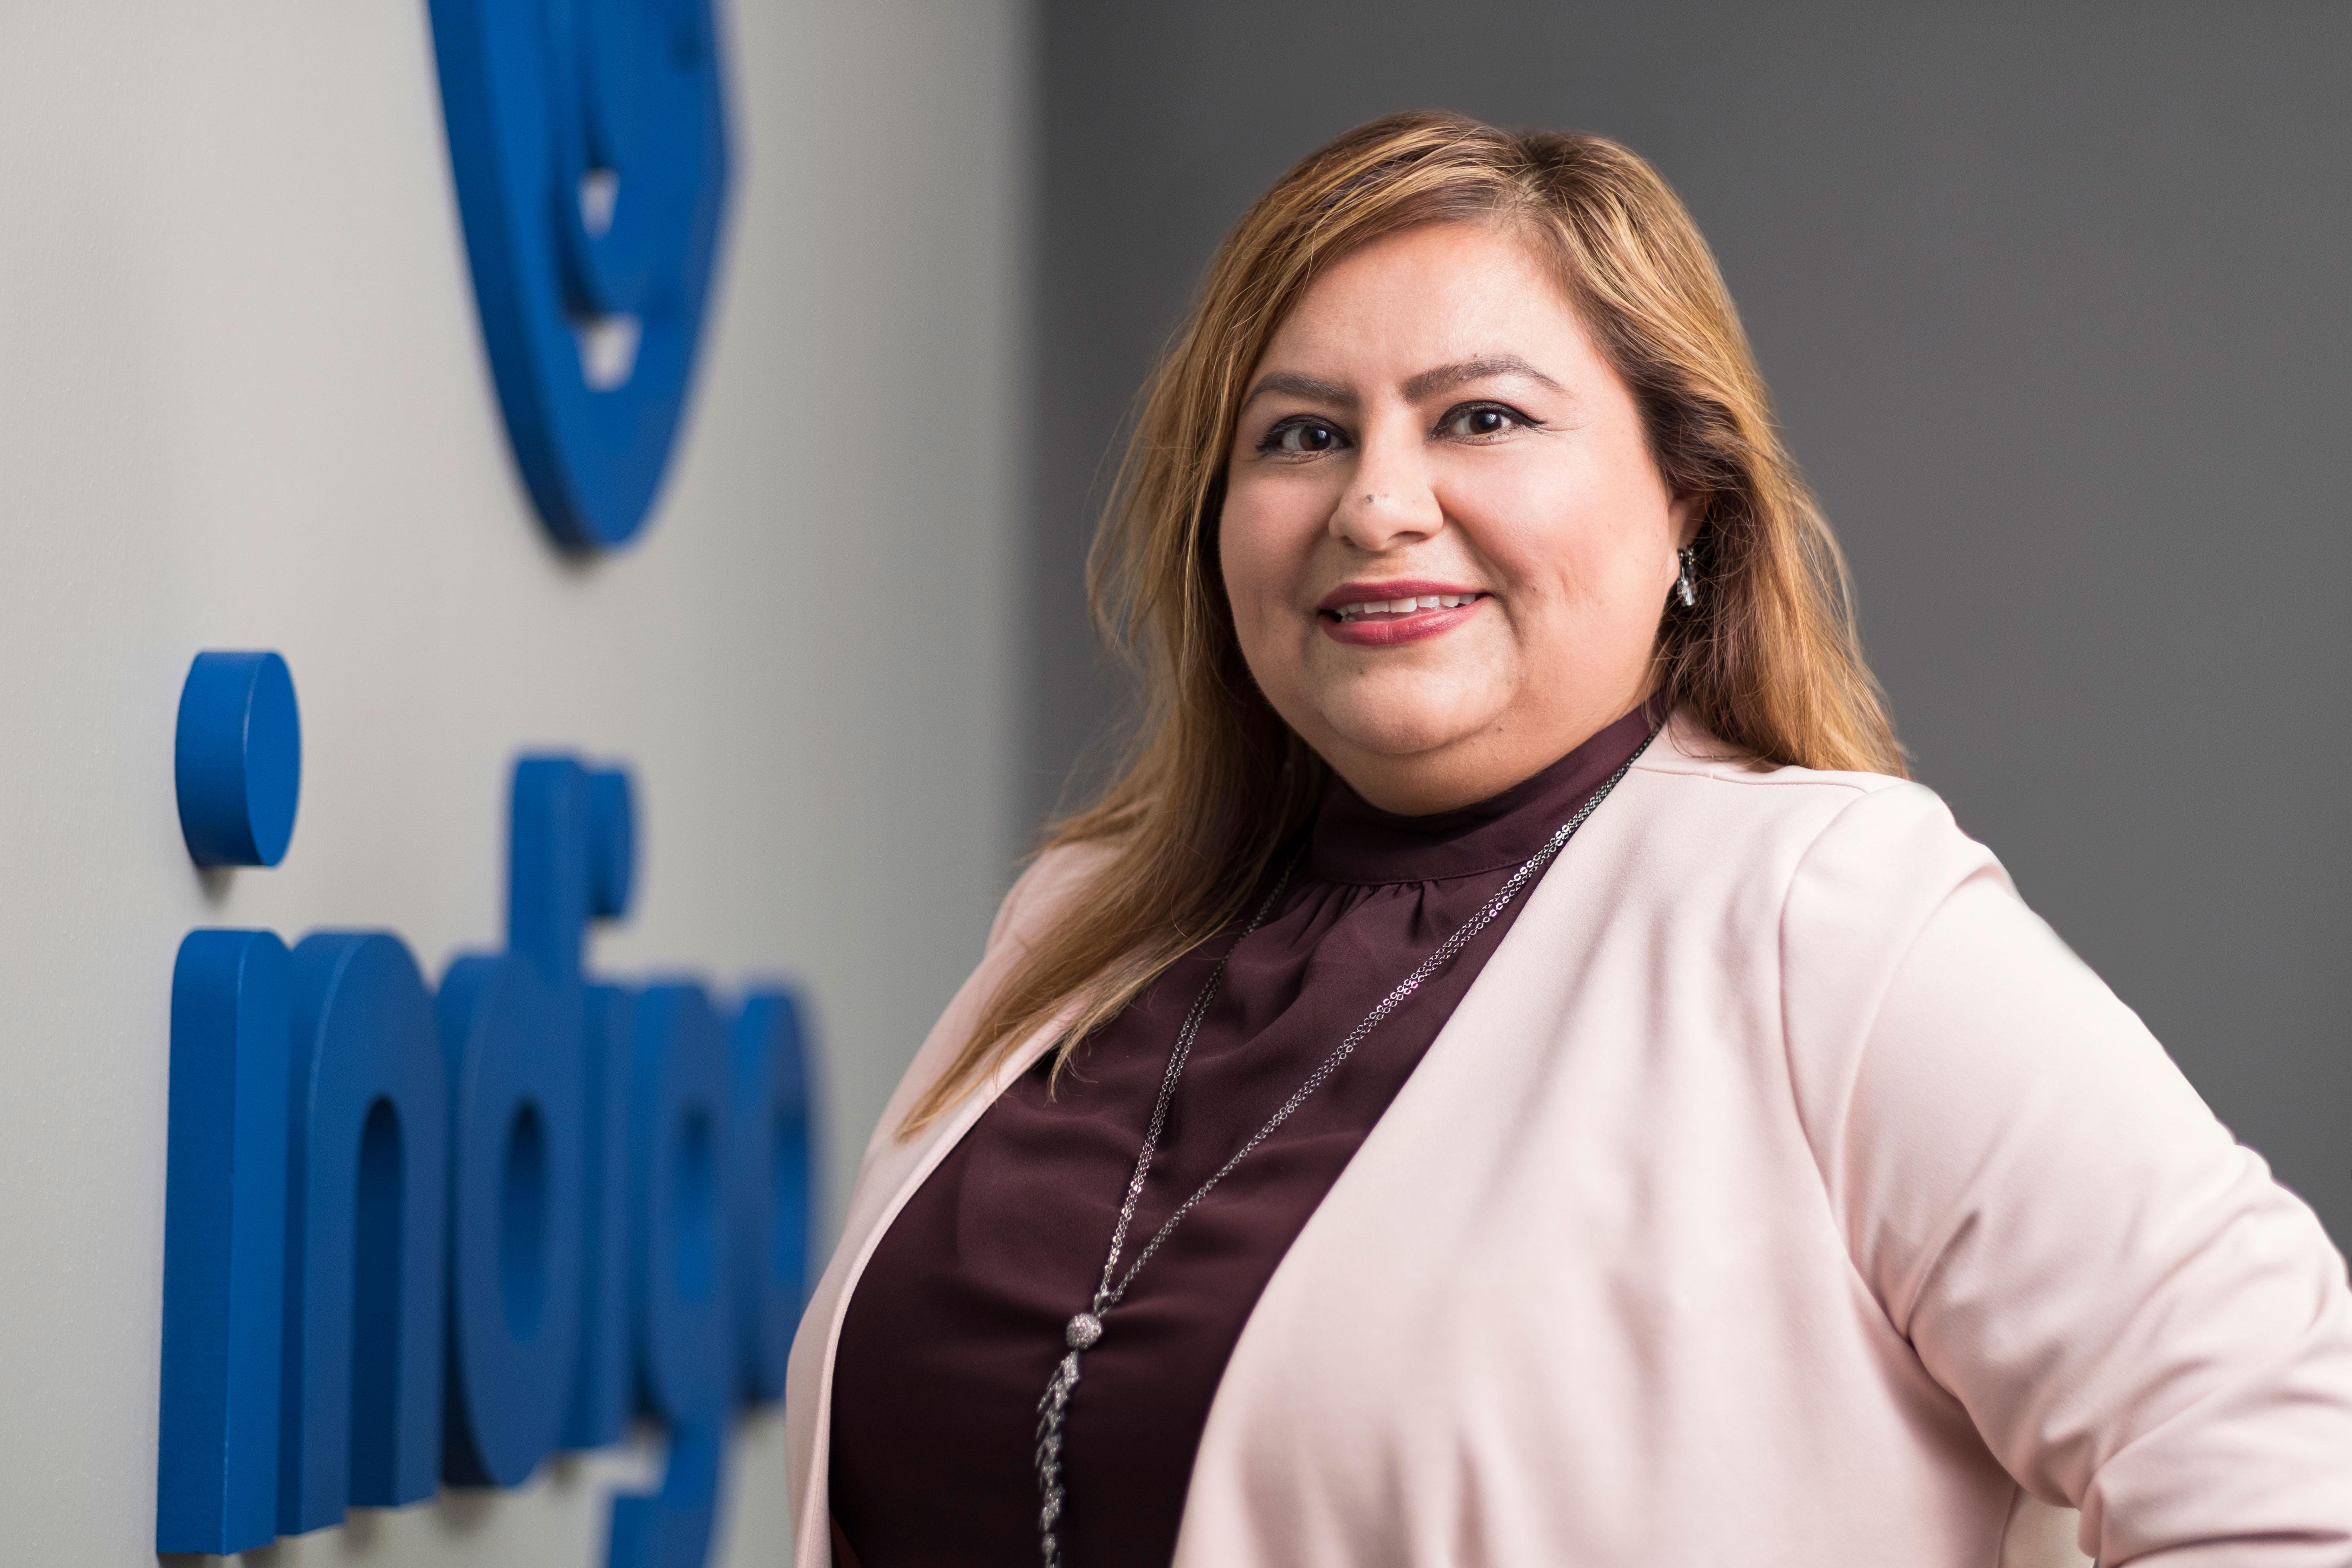 Evie Hernandez